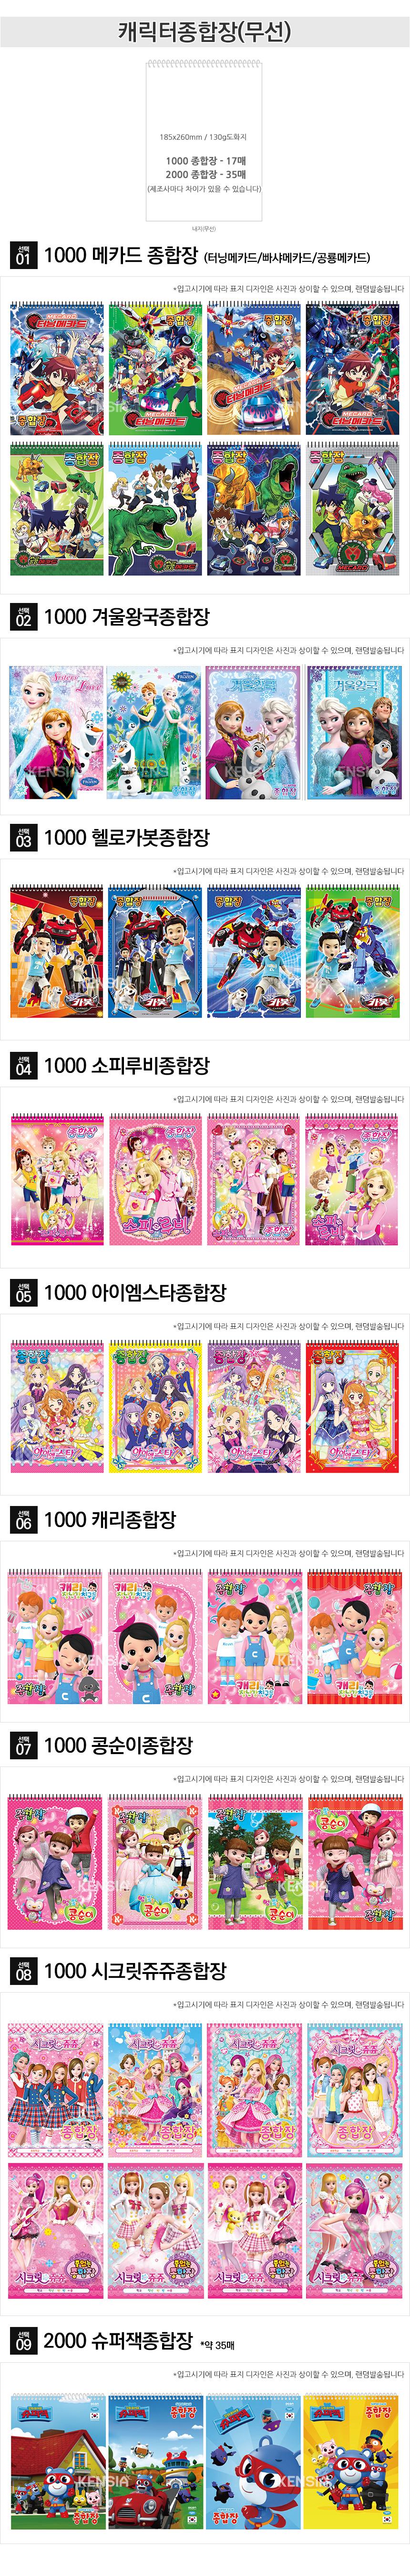 1000_character_mini_skb.jpg